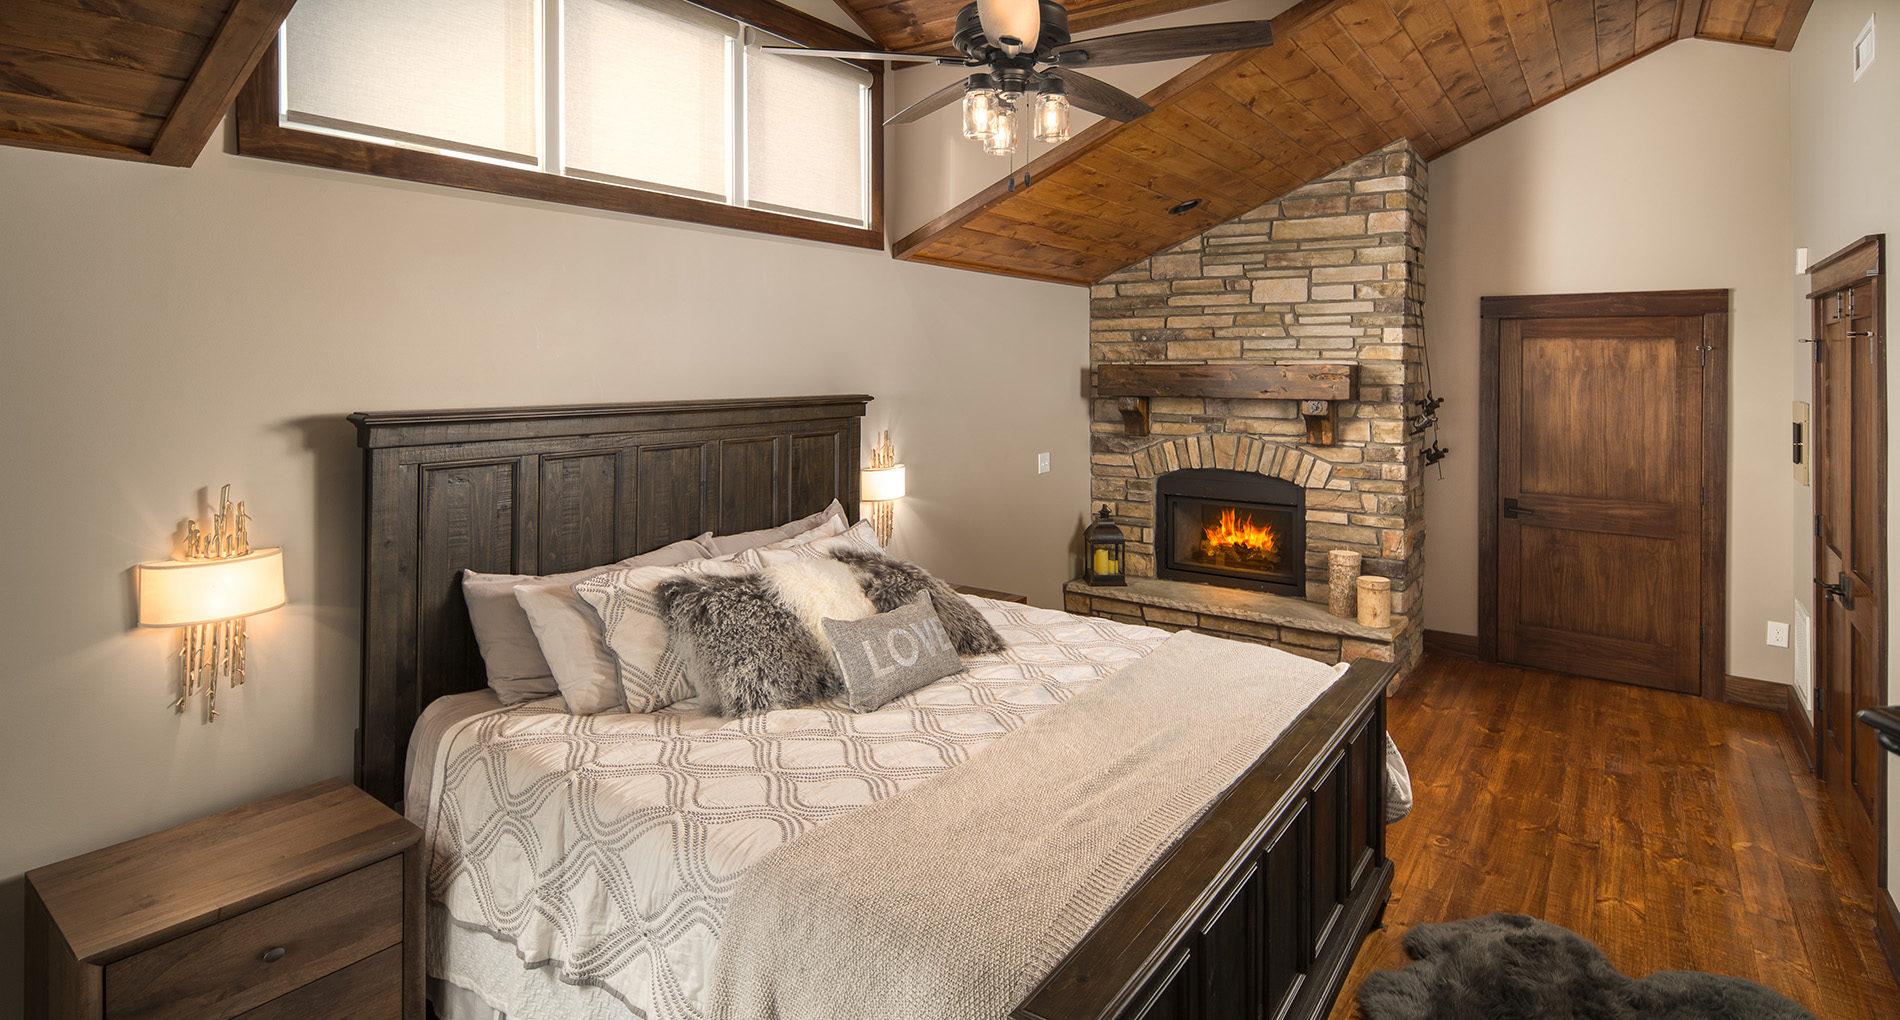 Home Remodel Highcountry Valleyblvd Slider1